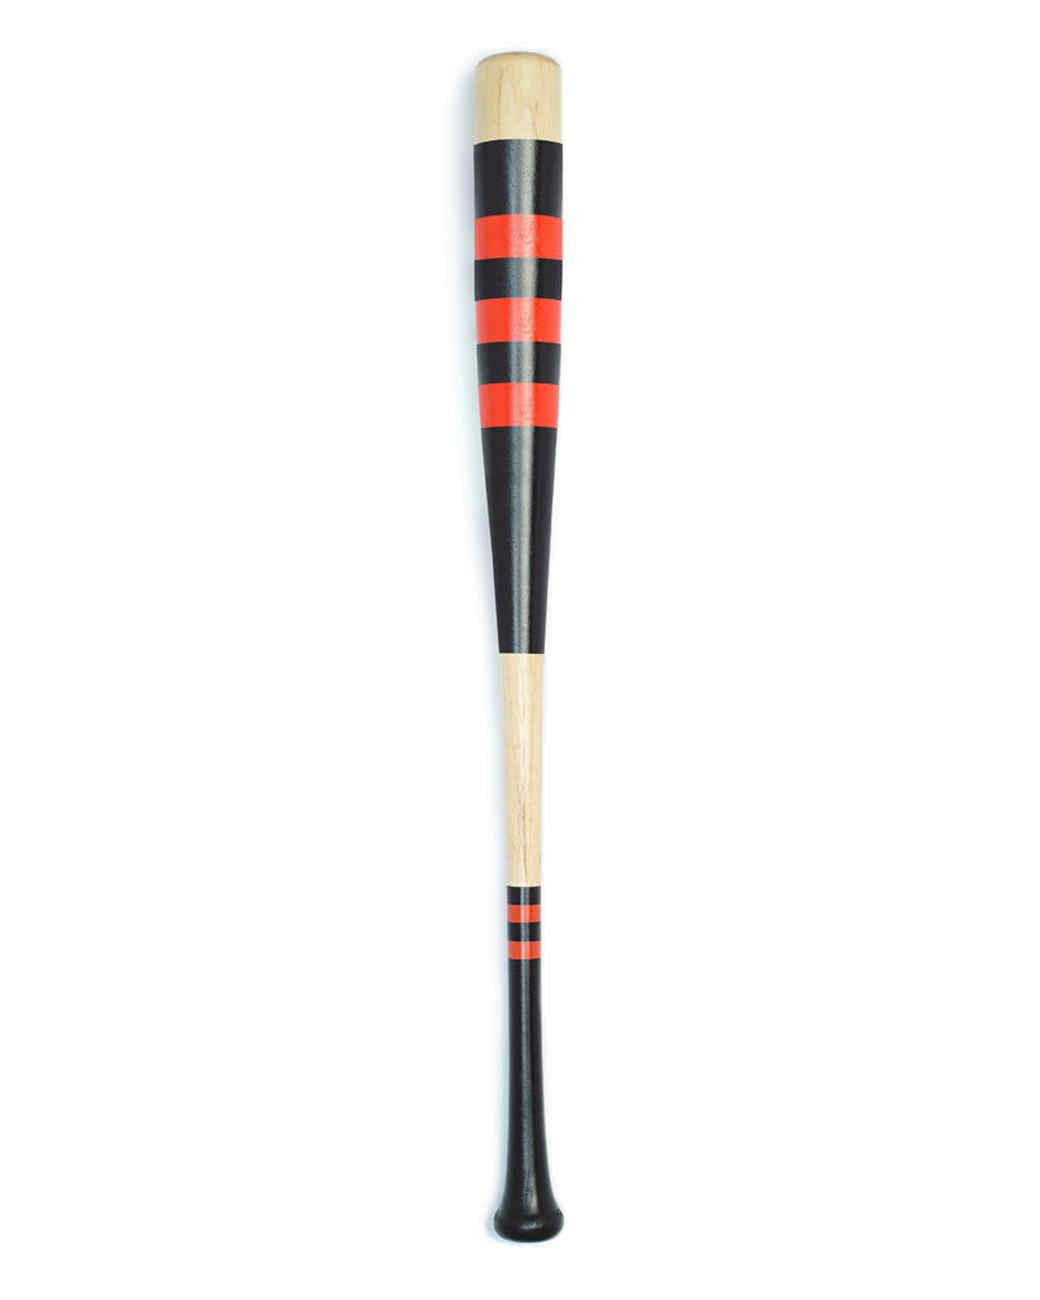 mitchell-bat-co-red-black-bat-1114.jpg